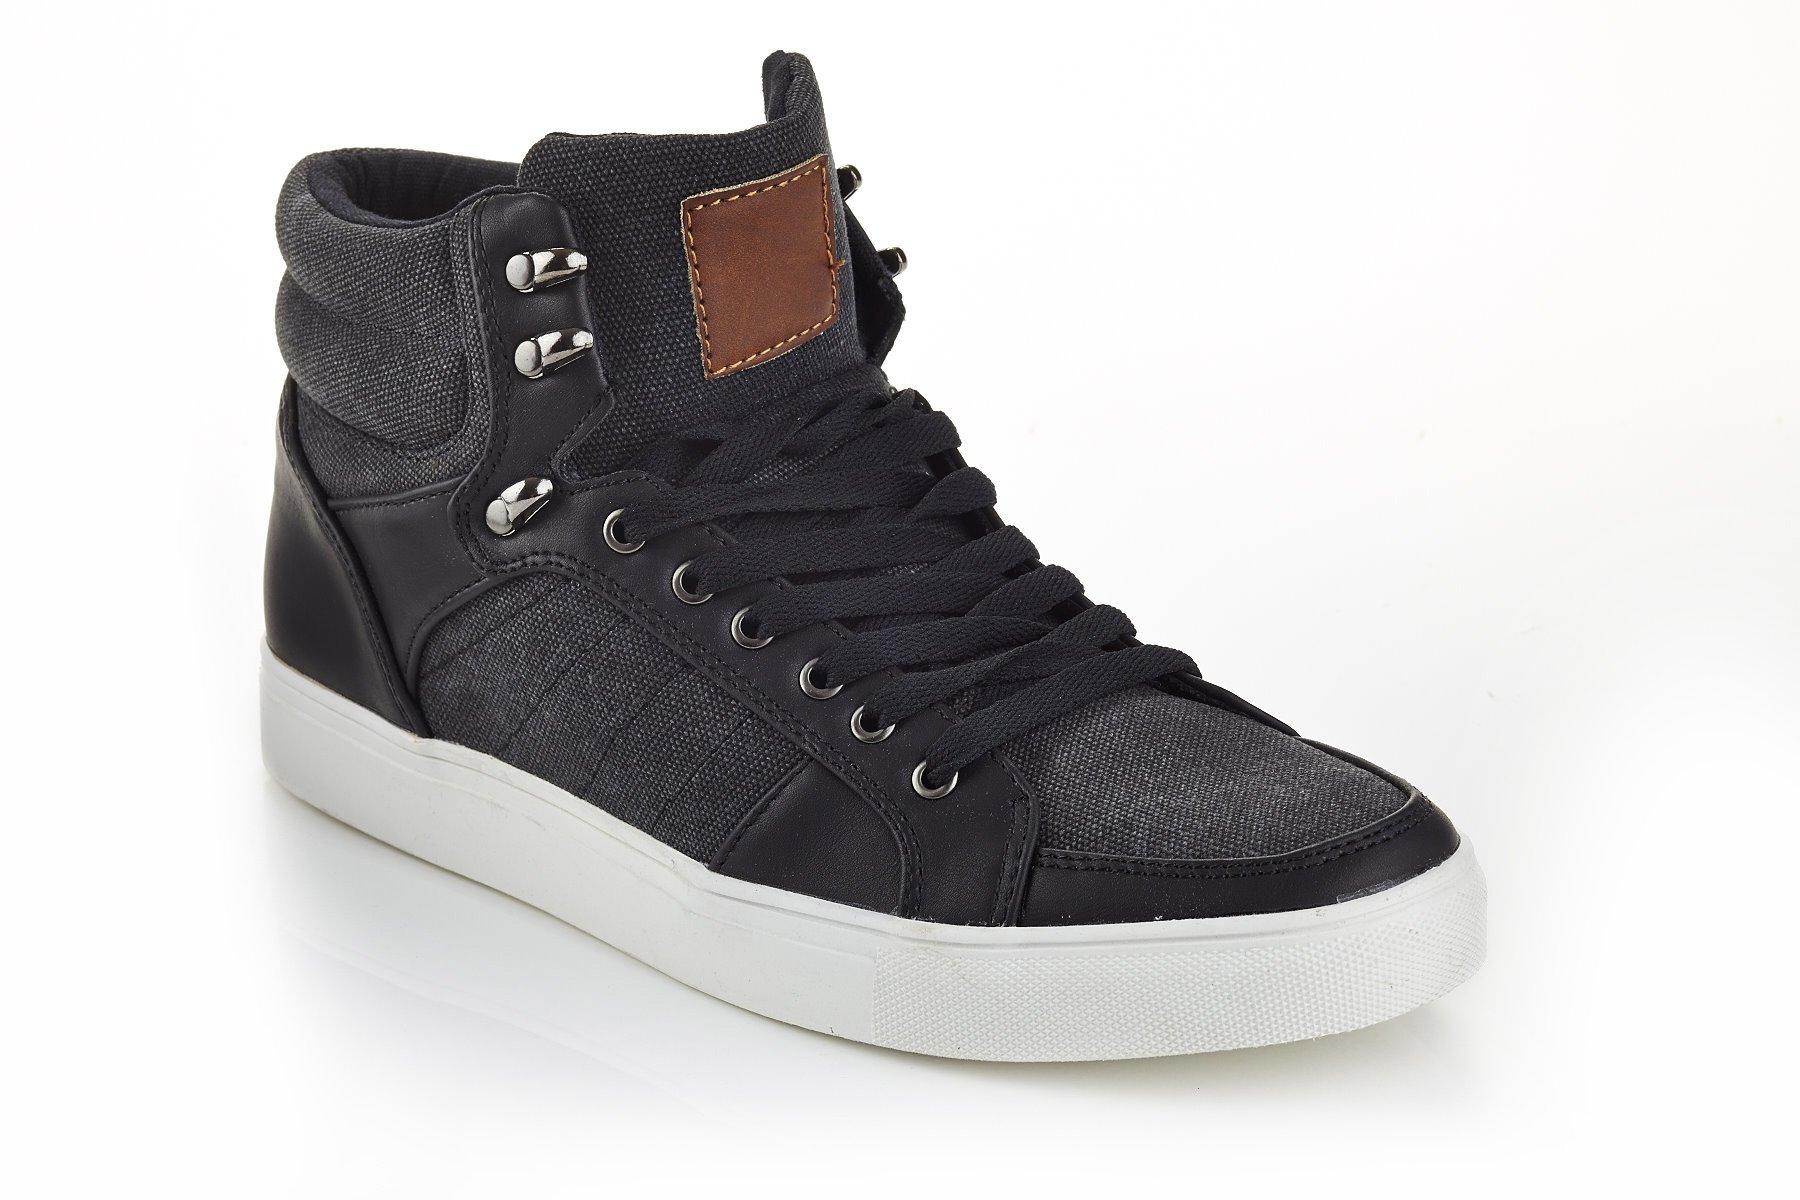 Franco Vanucci Mens High Top Lace Up Sneakers Black Black Size 13